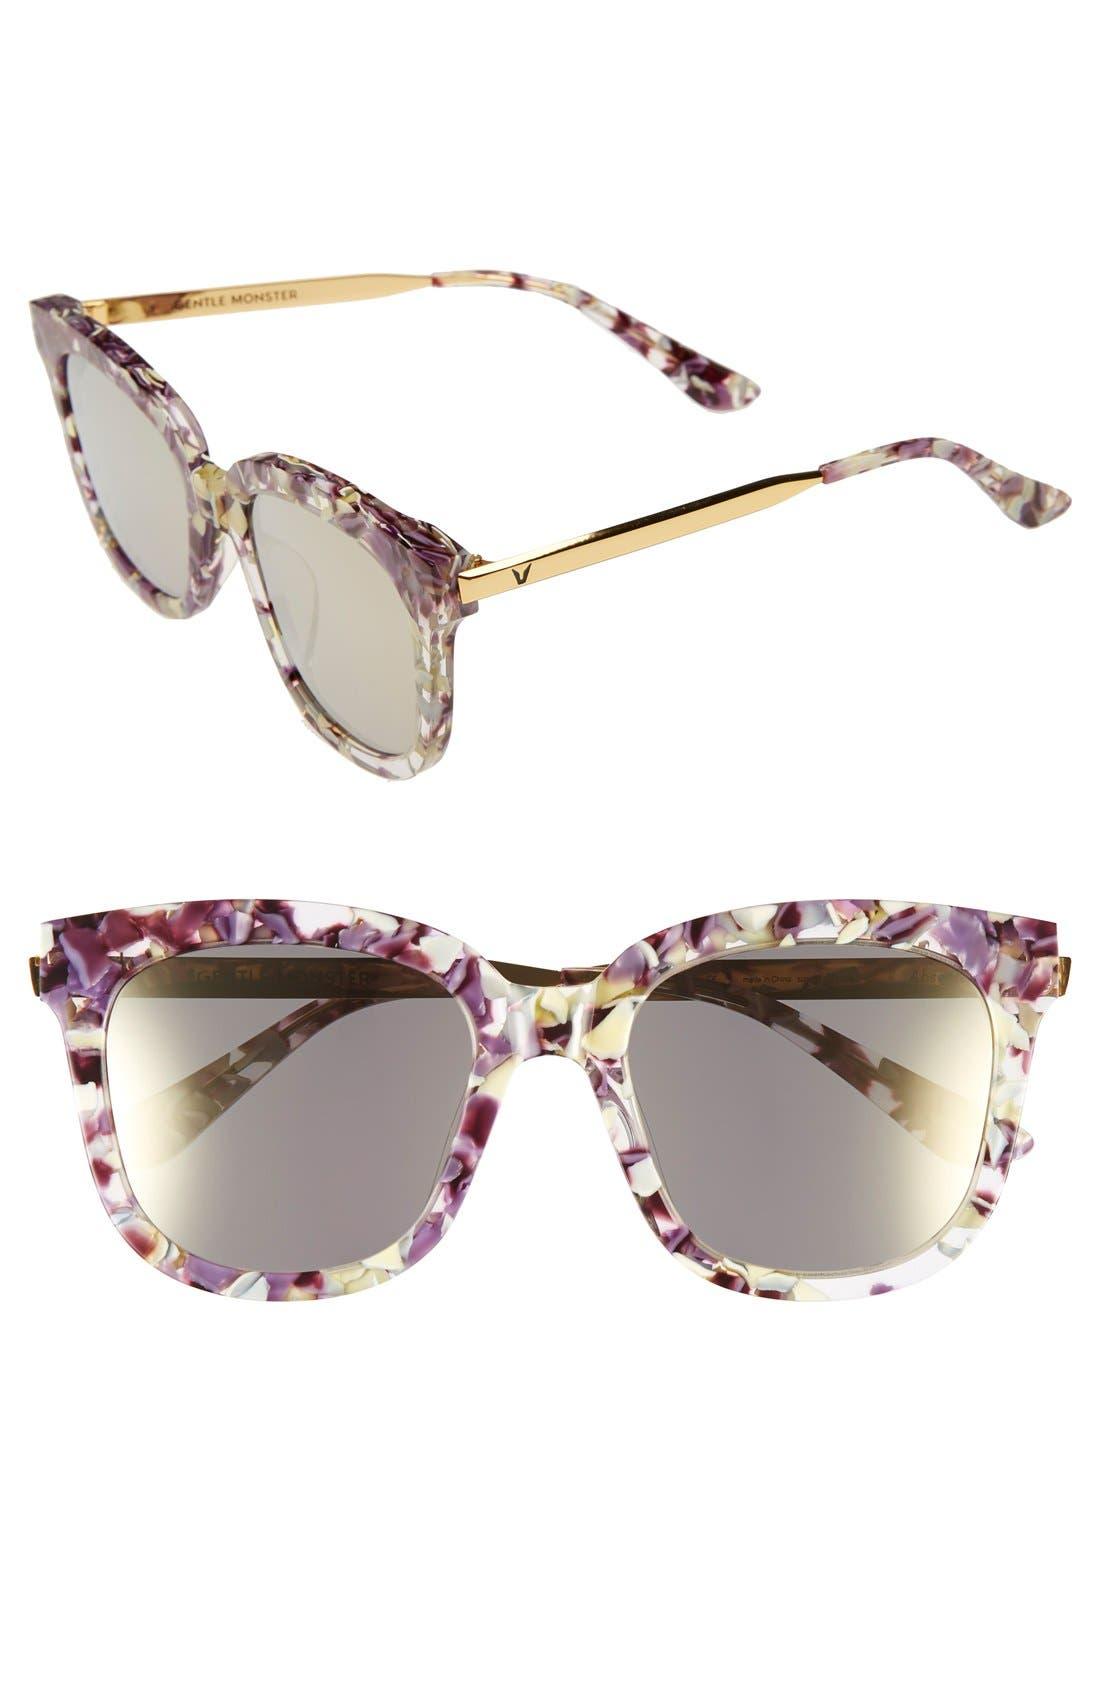 54mm Sunglasses,                         Main,                         color, Light Purple/ Clear